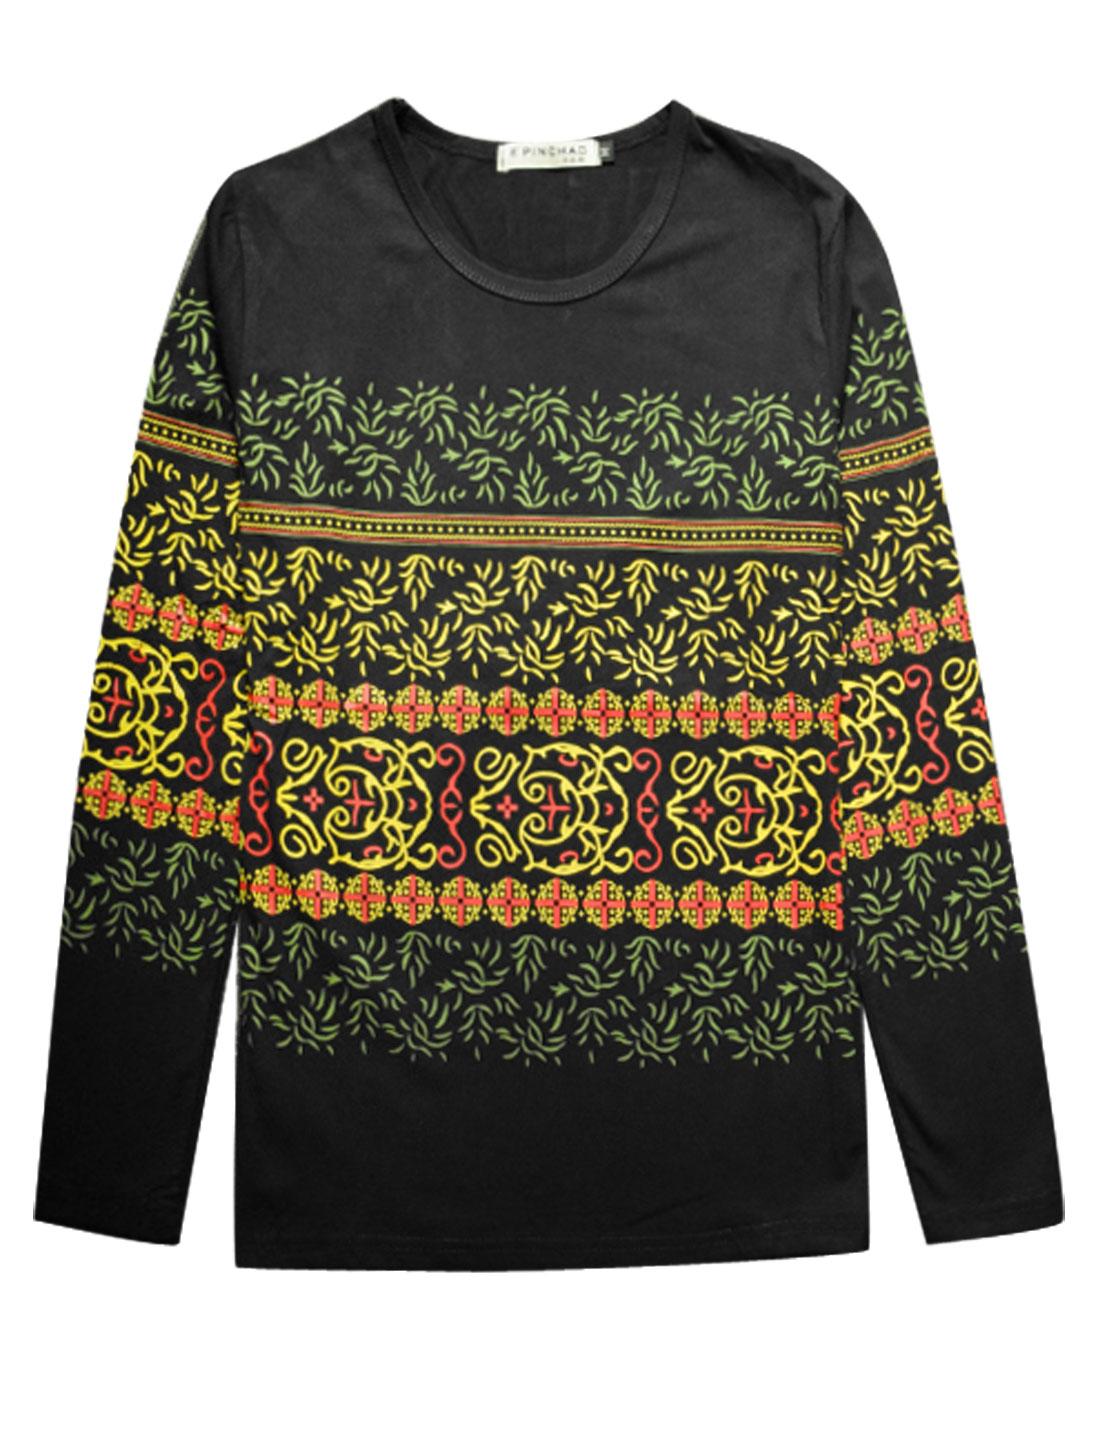 Man Long Sleeves Novelty Prints Slipover T-Shirts Black M